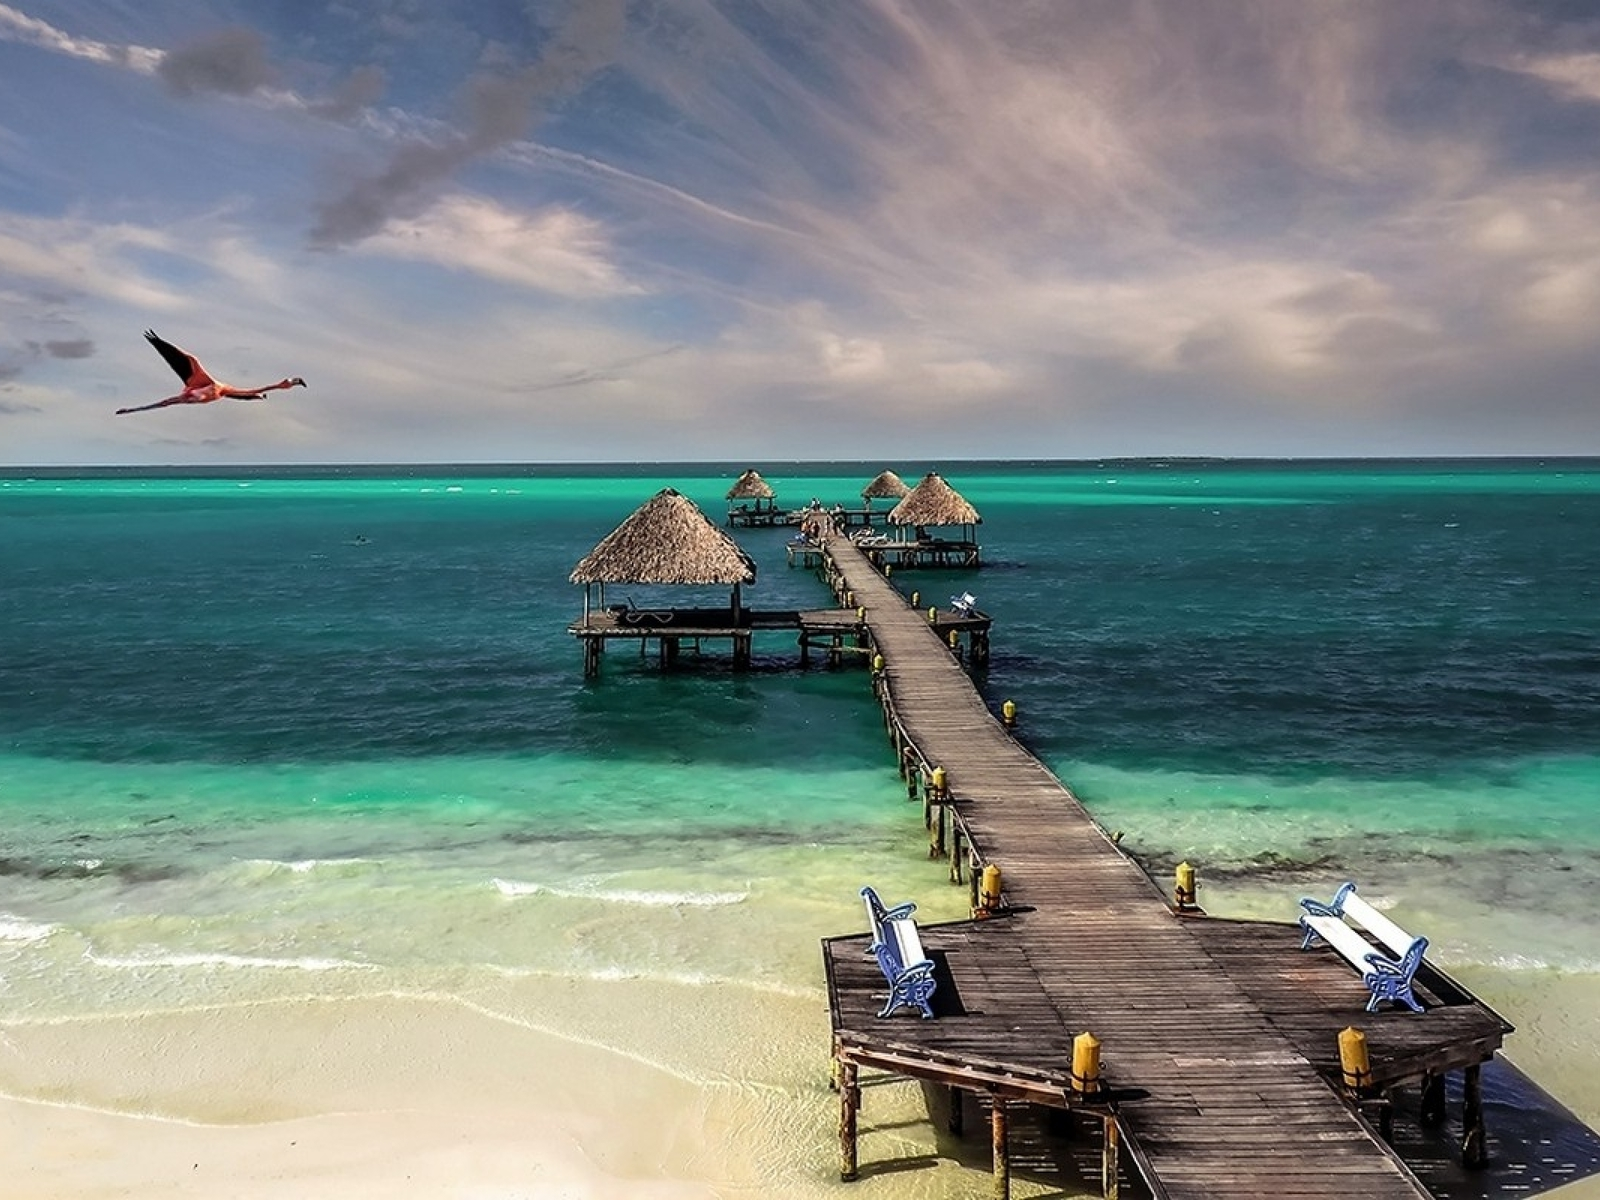 Cuba beach bird sea sand (1600x1200)